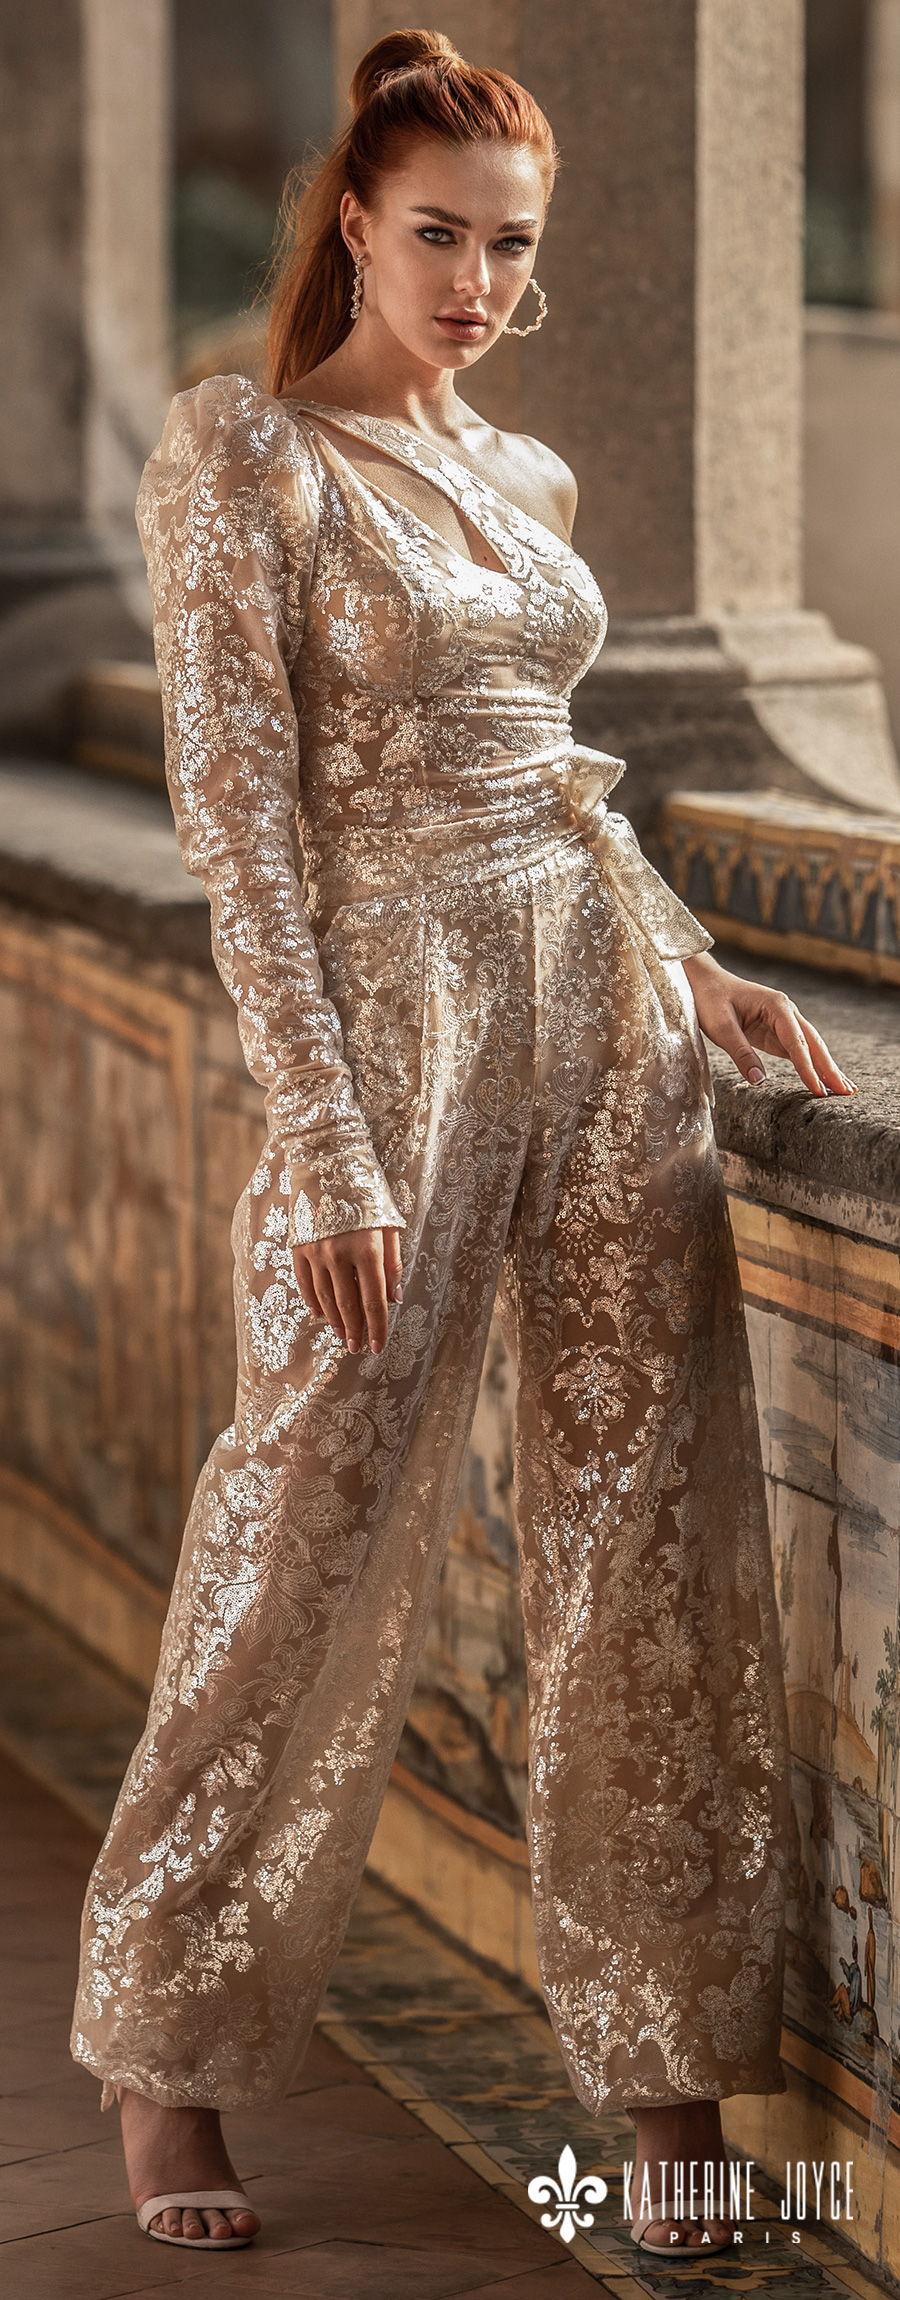 katherine joyce 2021 naples bridal one shoulder long sleev full embellishment glamorous golden jumpsuit wedding dress (manila) lv